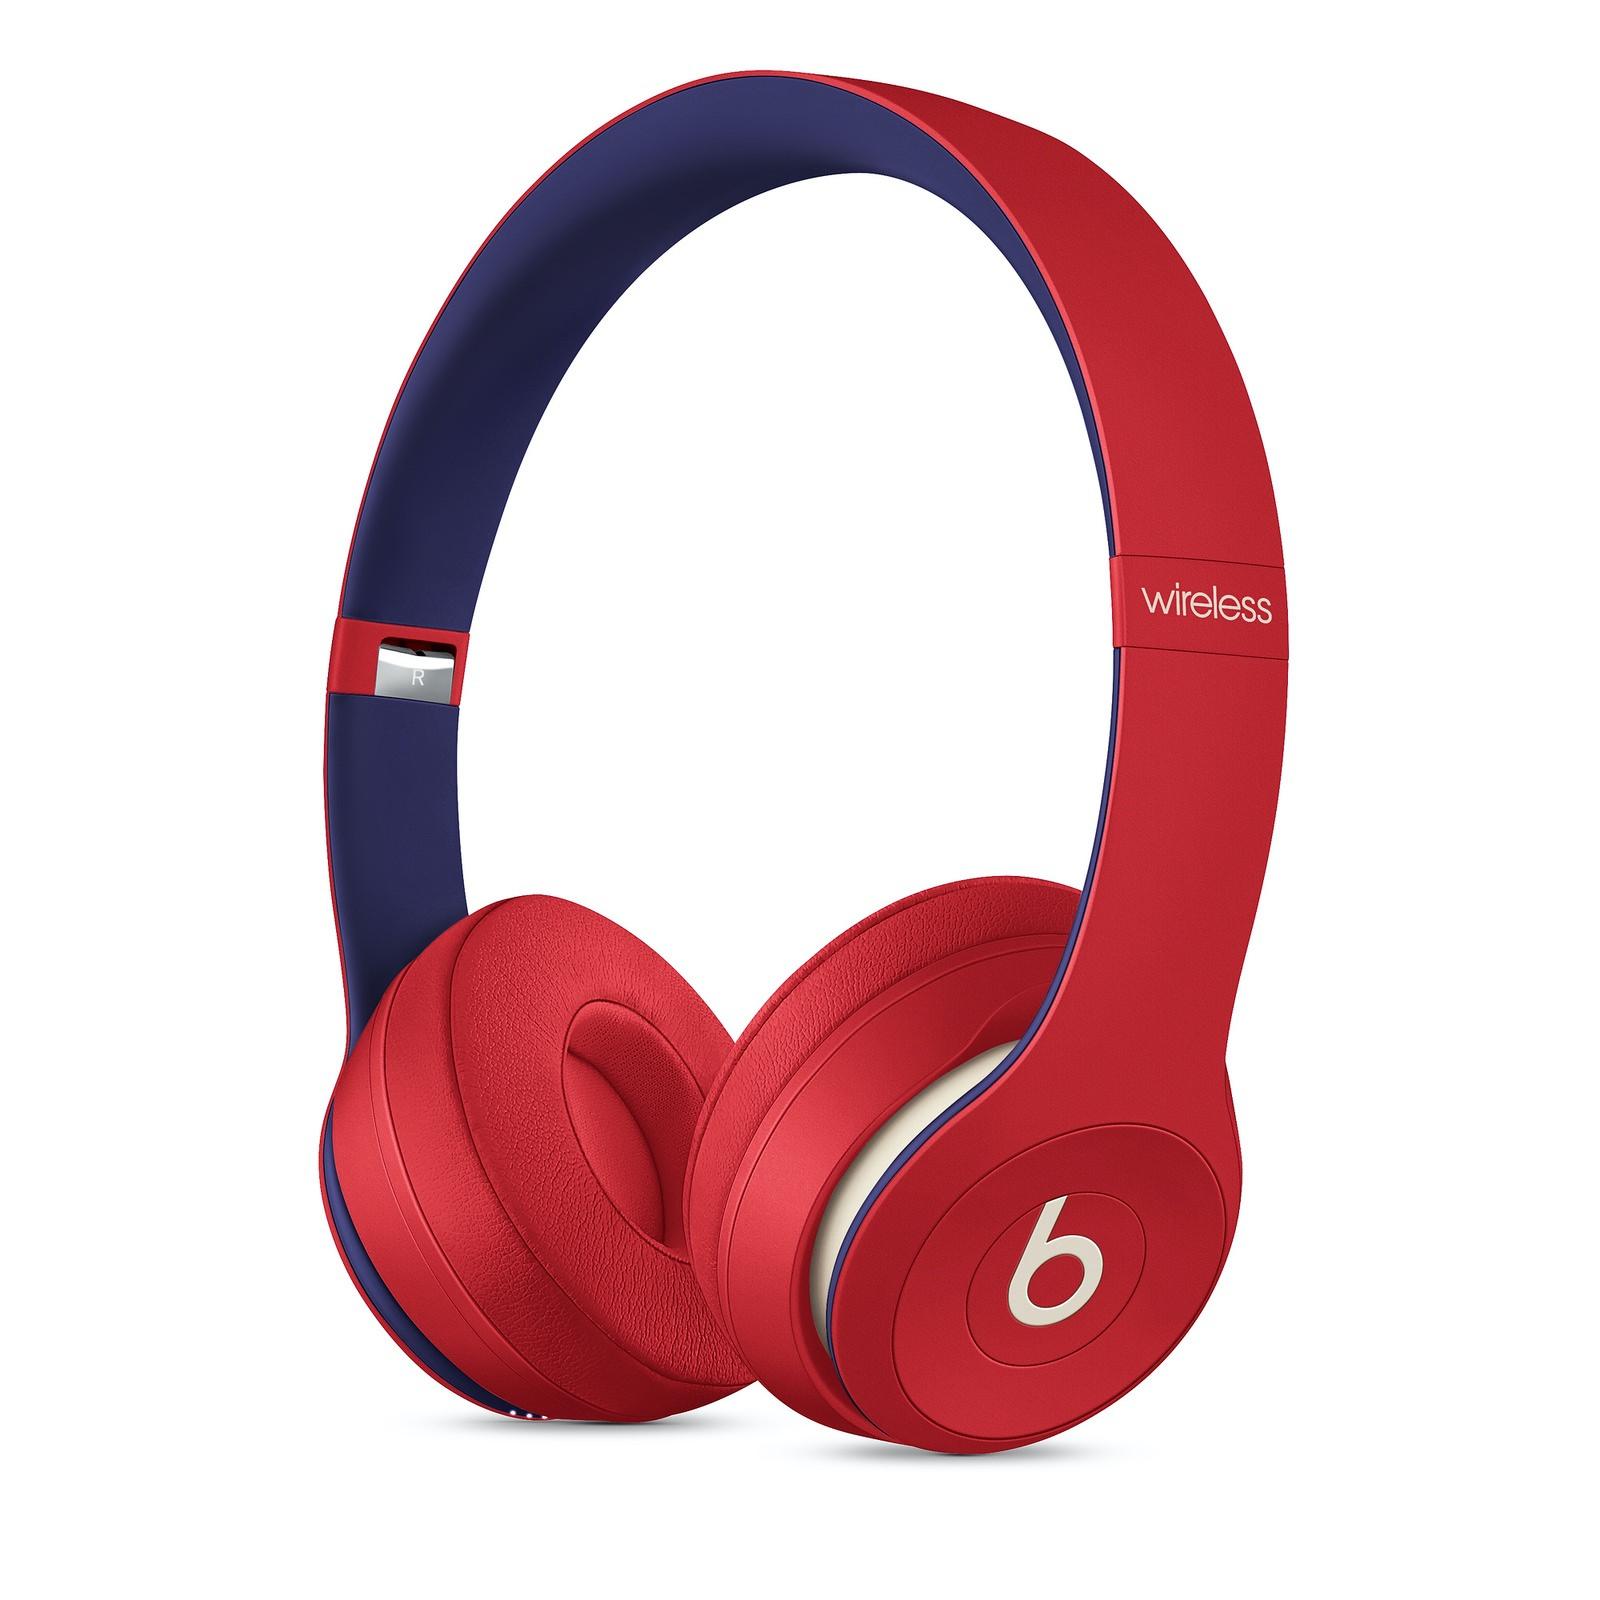 Beats-Solo3-Wireless-Beats-Club-Collection-05.jpeg